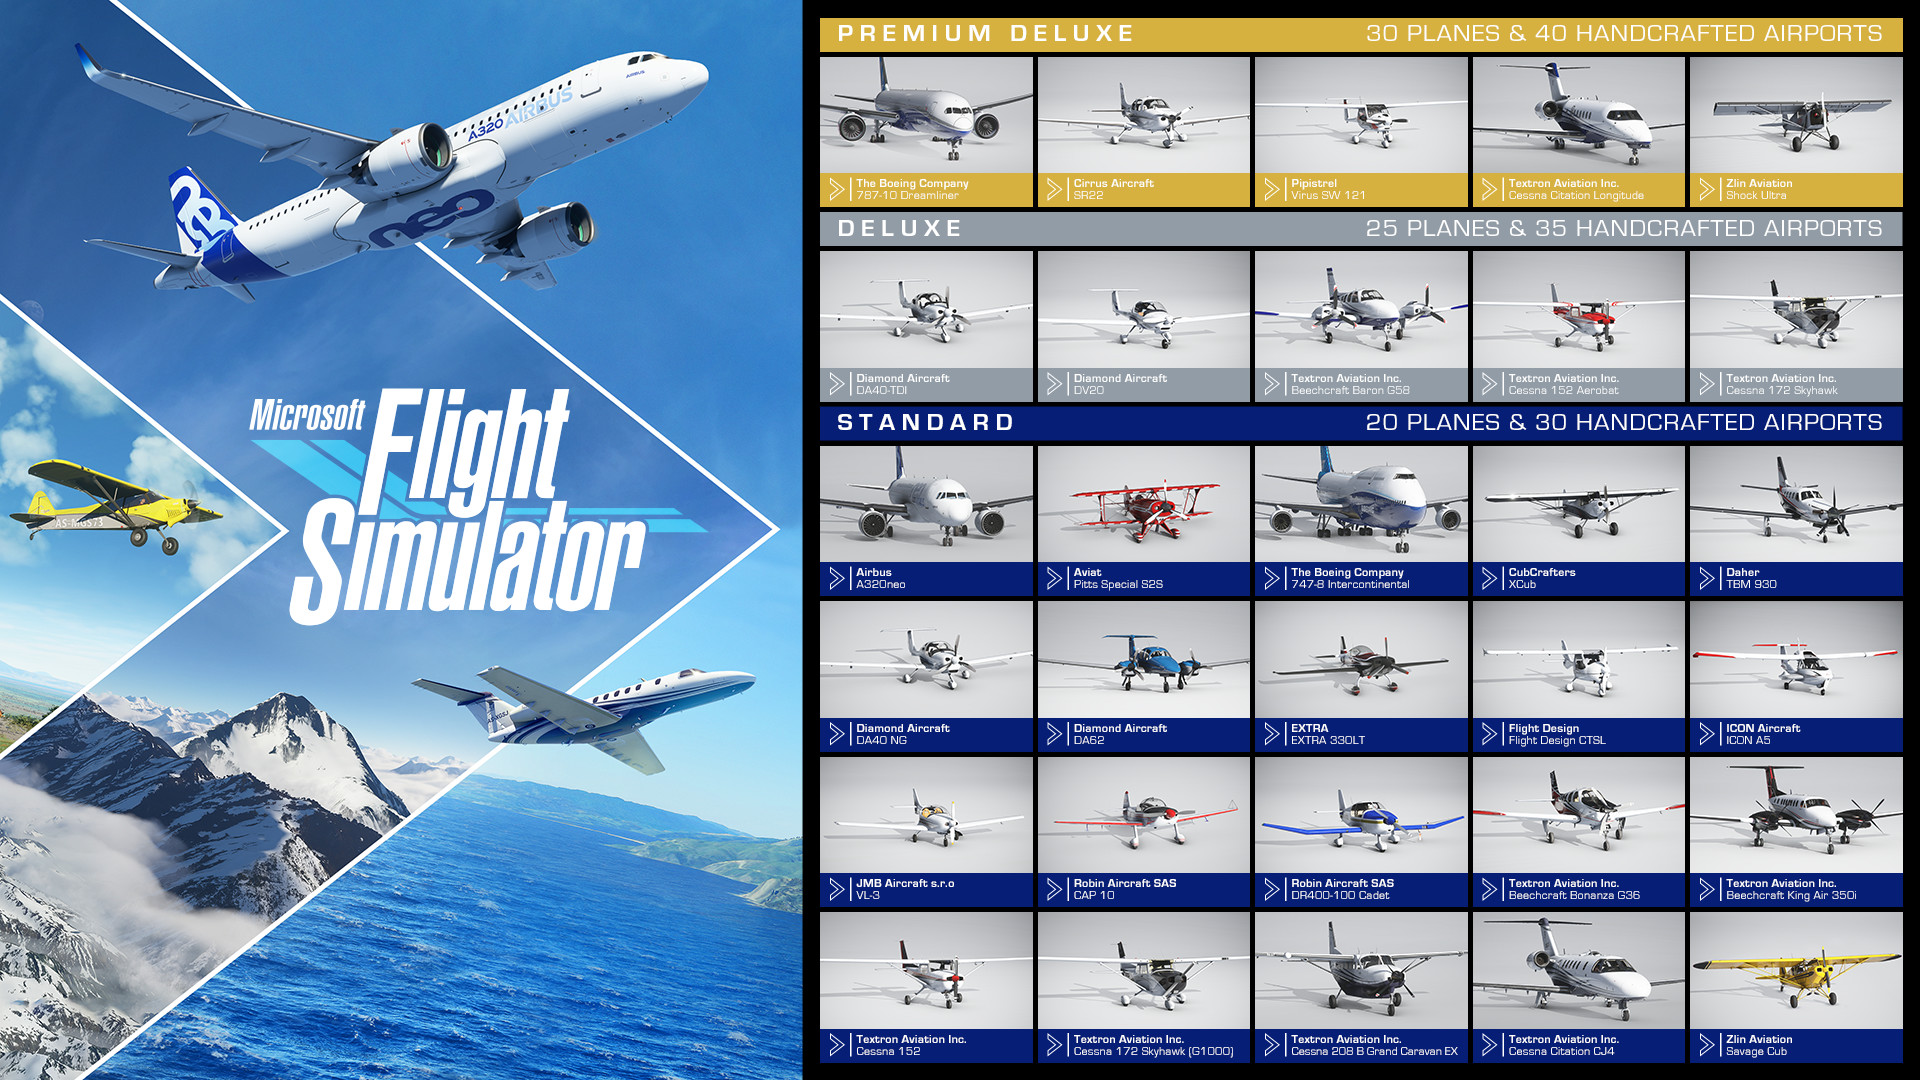 Microsoft Flight Simulator (2020) Screenshot 1